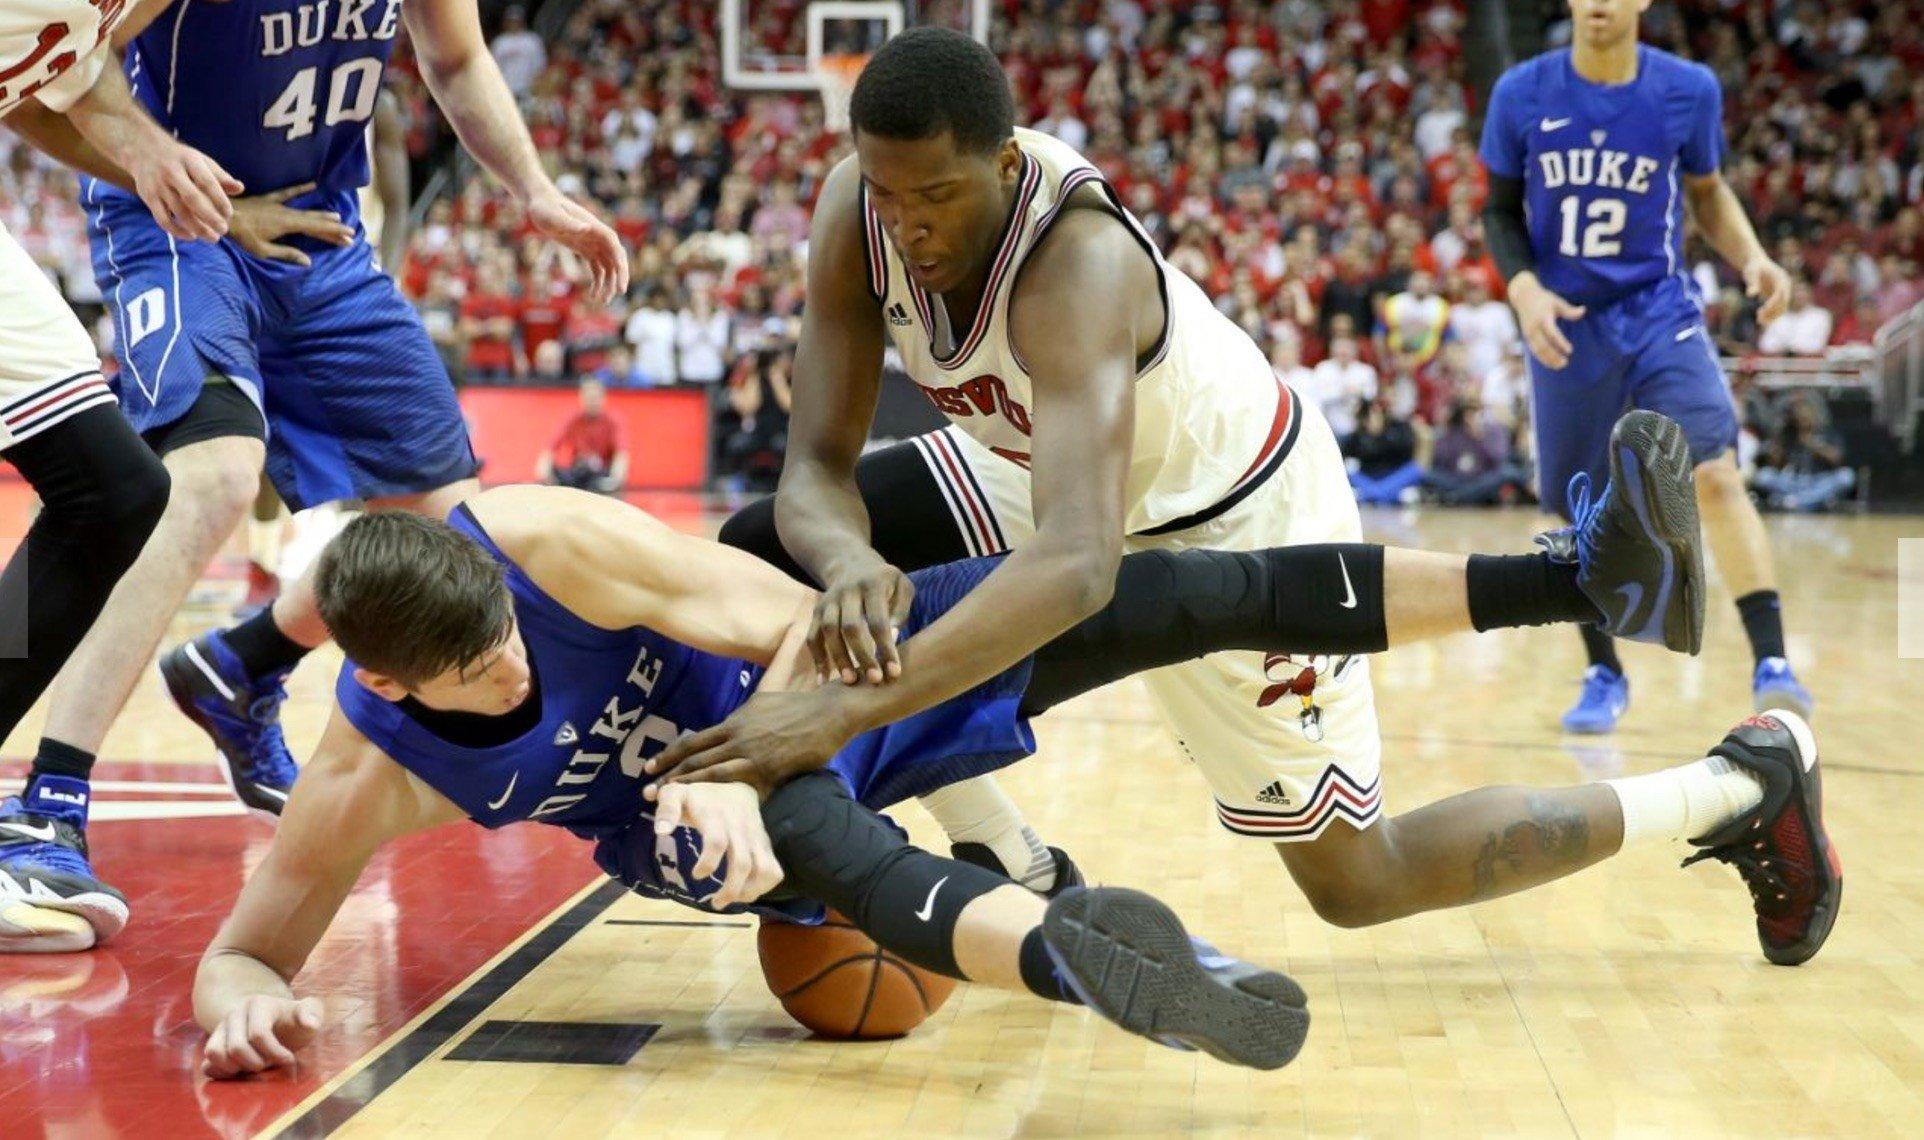 Duke's Grayson Allen (left) and Jaylen Johnson of Louisville scrambled for a loose ball last season. (AP Photo.)